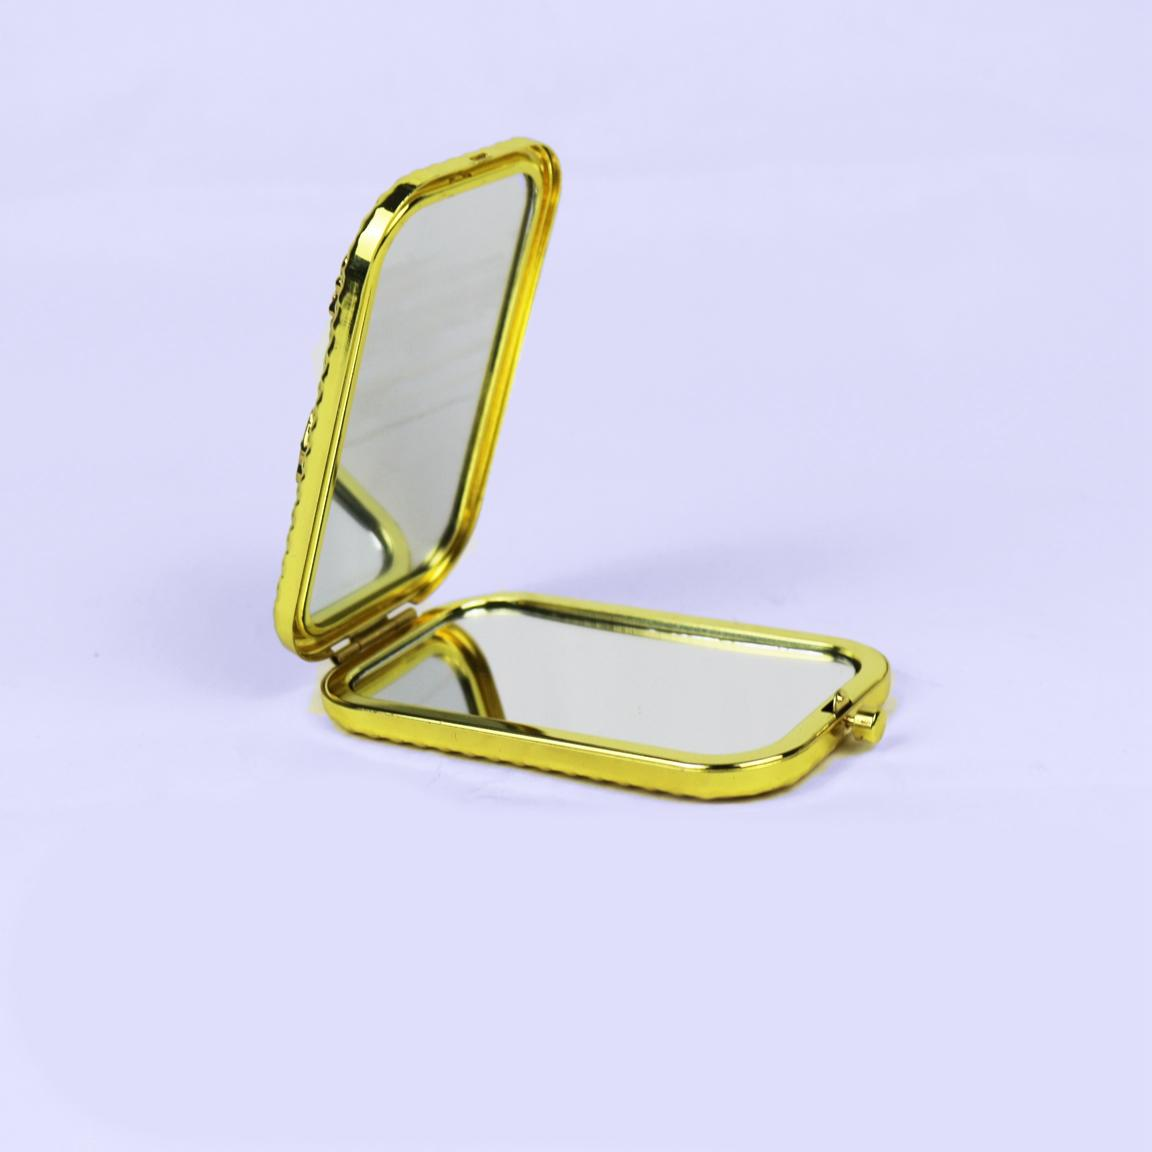 European retro double-sided folding small mirror